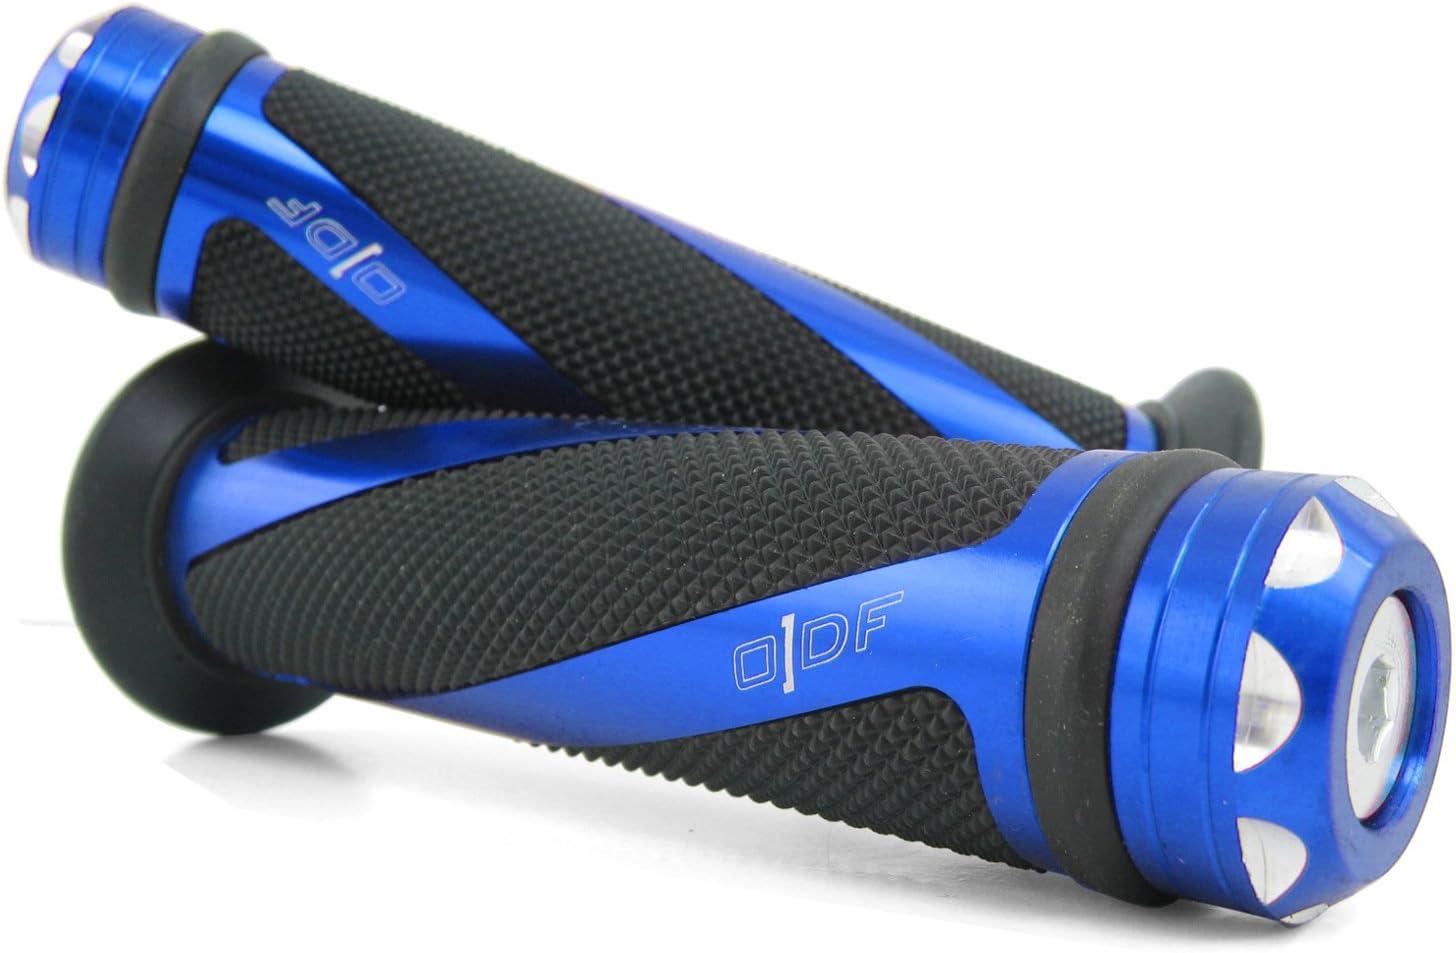 100 100 // RX//RS 80 100 // PW 80 Coil//Blau Lenkergriffe kompatibel mit Yamaha FS 80